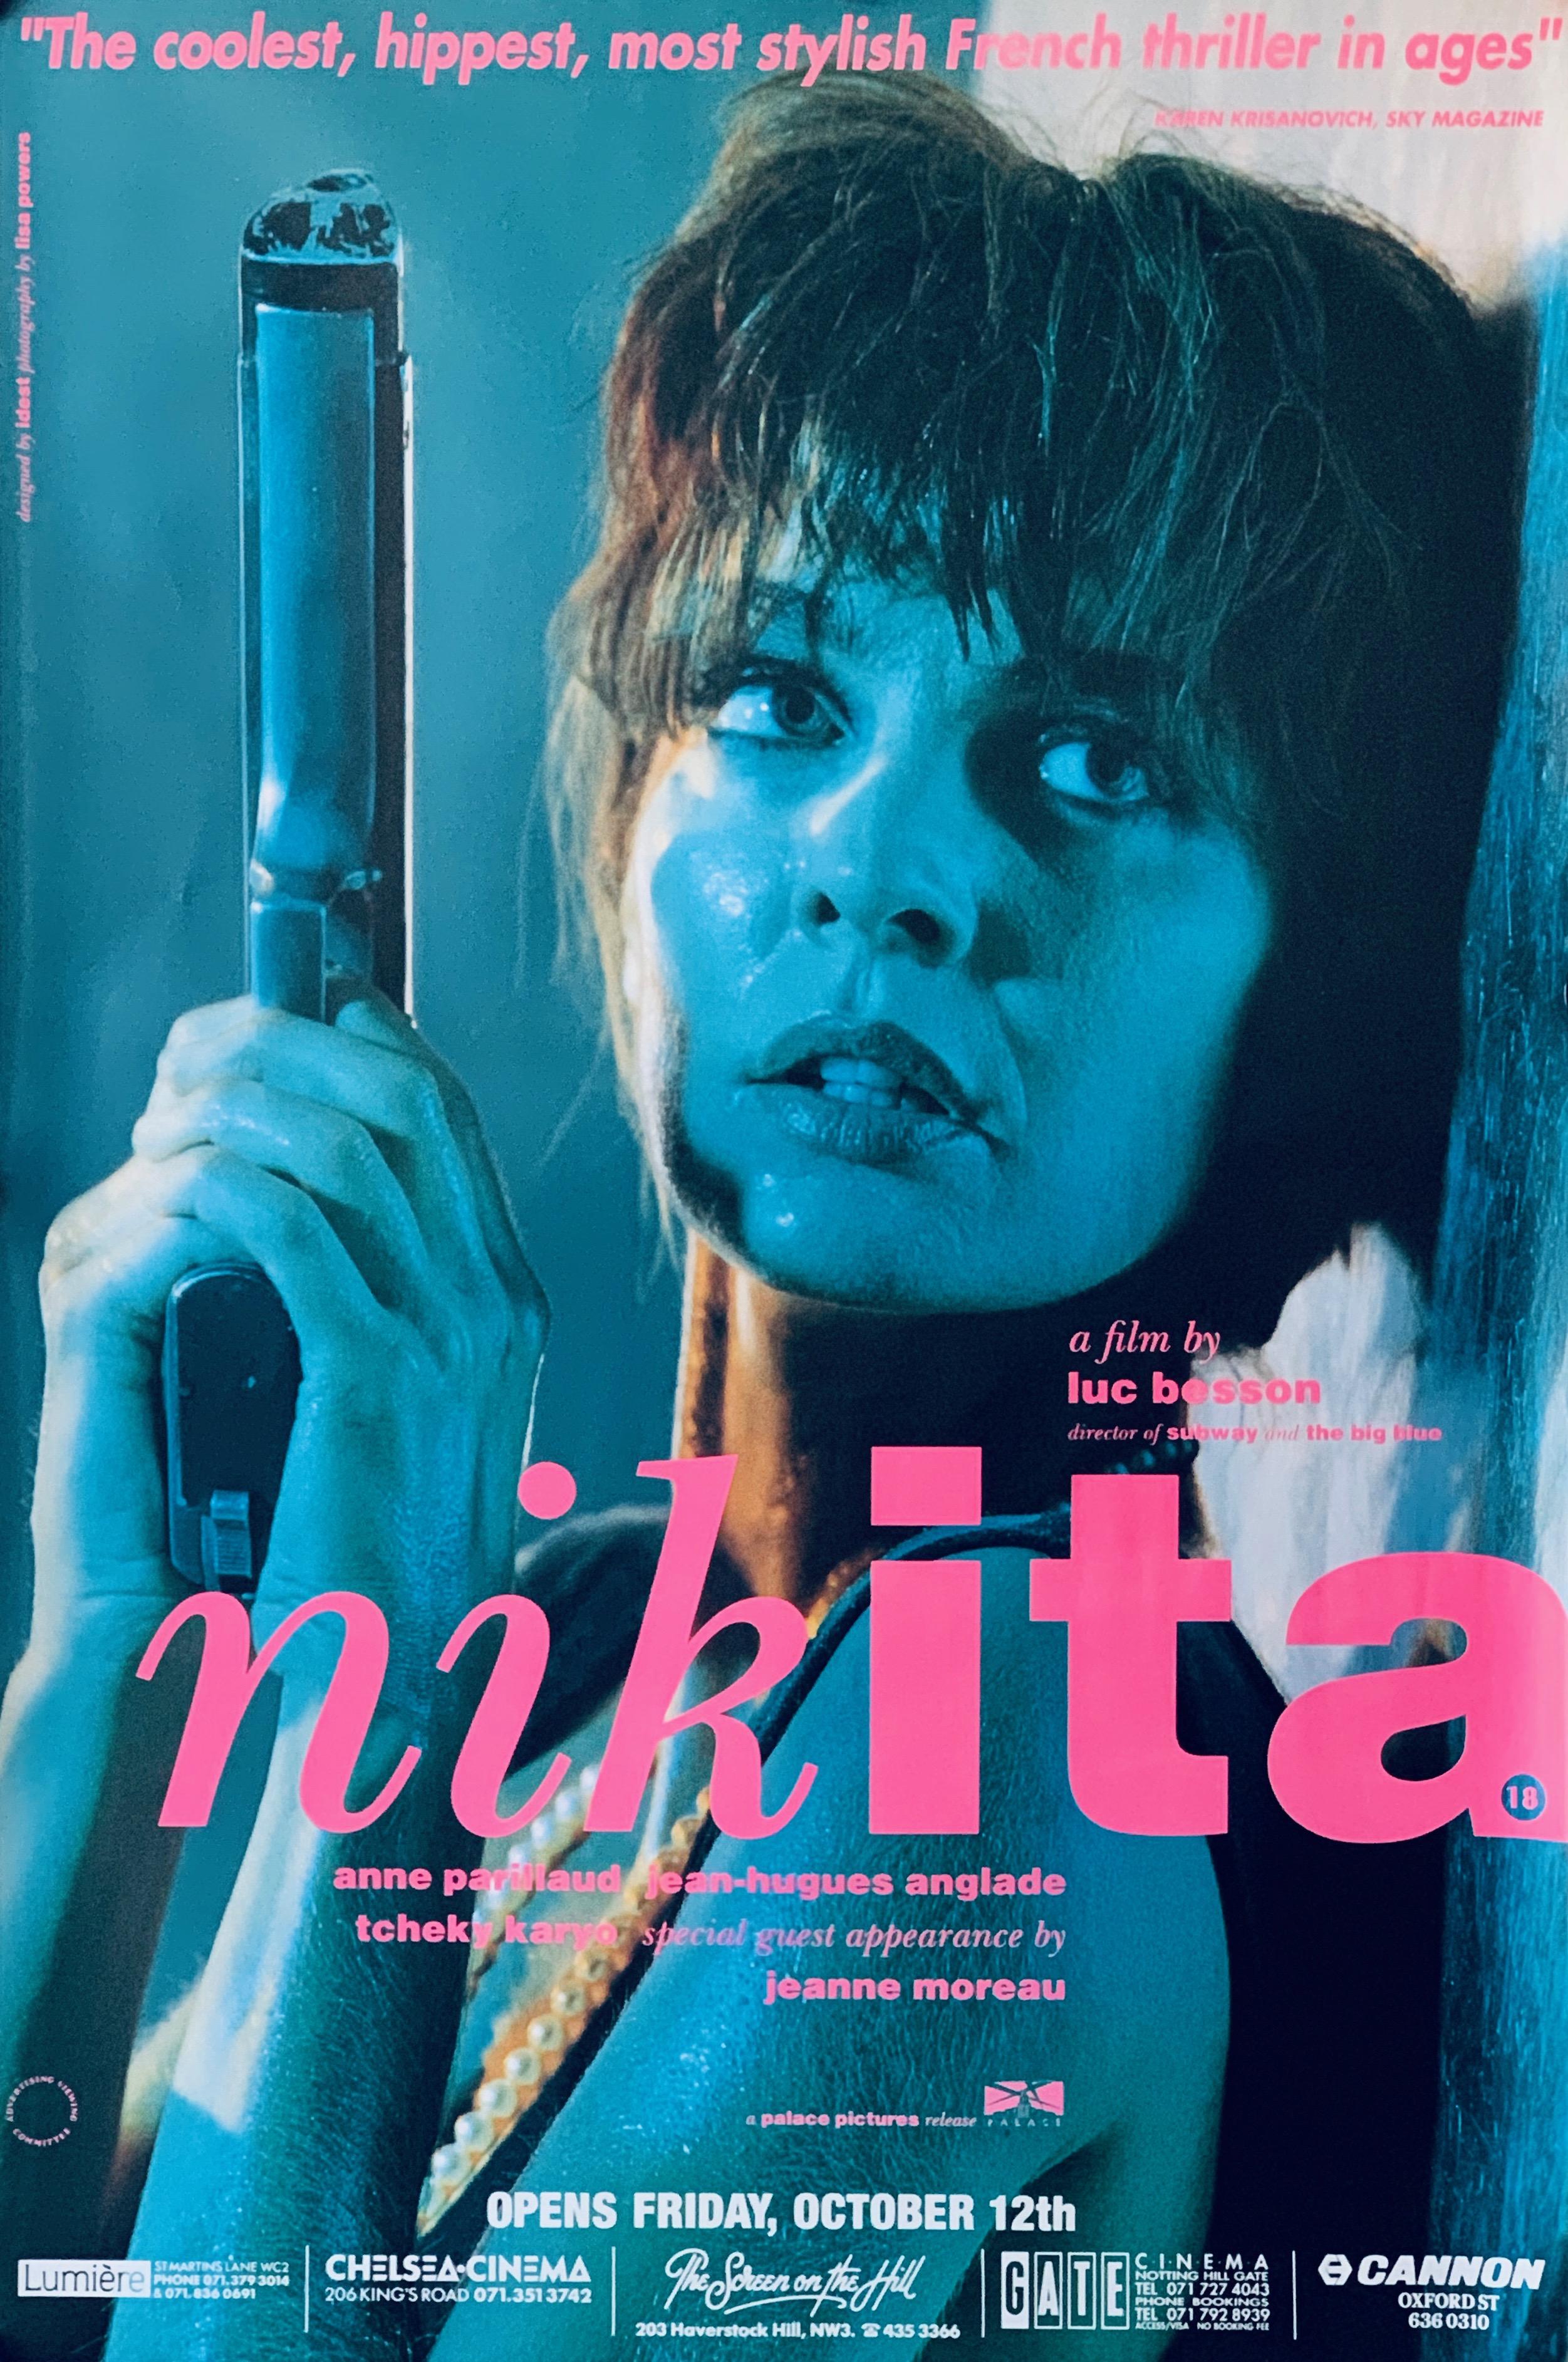 Original NIKITA Movie Poster - La Femme Nikita - Luc Besson